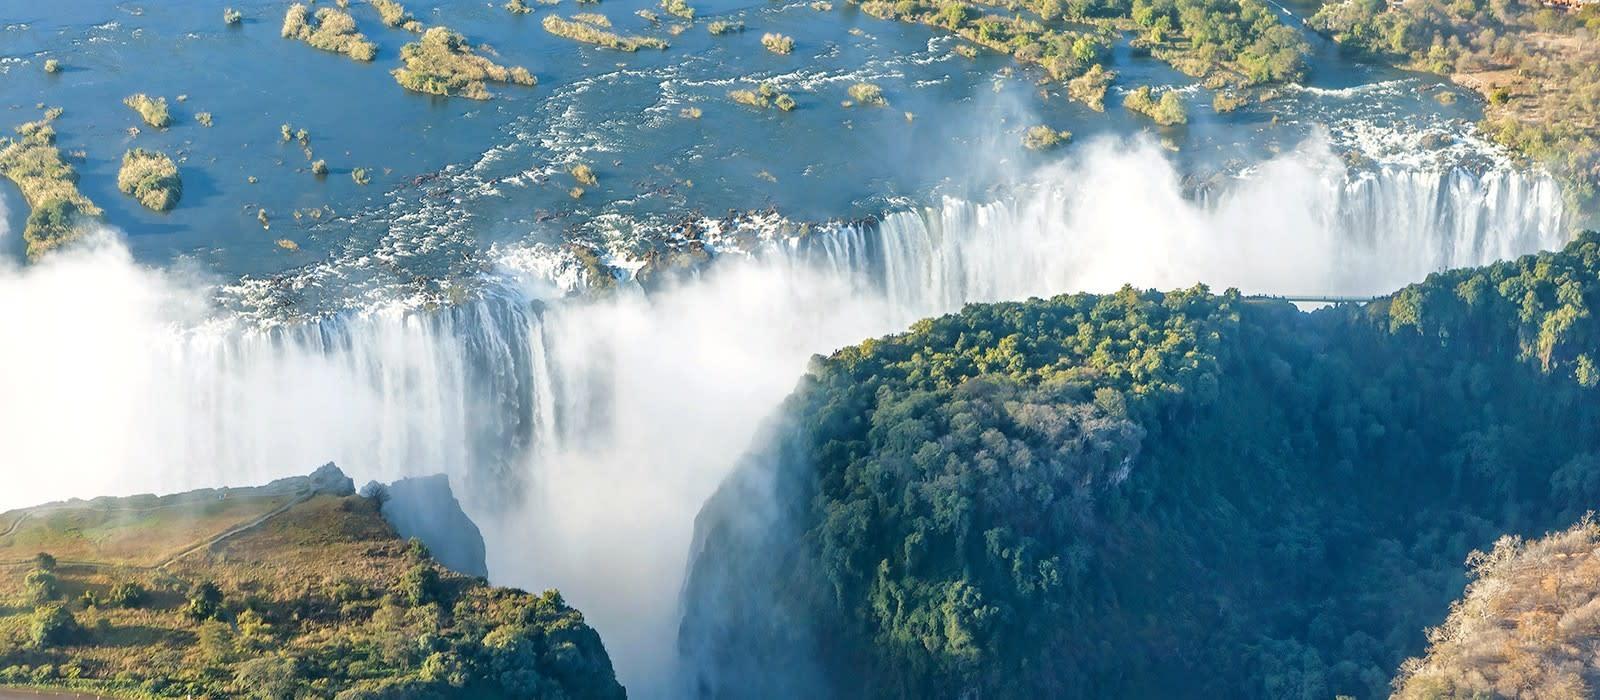 Simbabwe Reise: Klassisch & Hautnah Urlaub 1